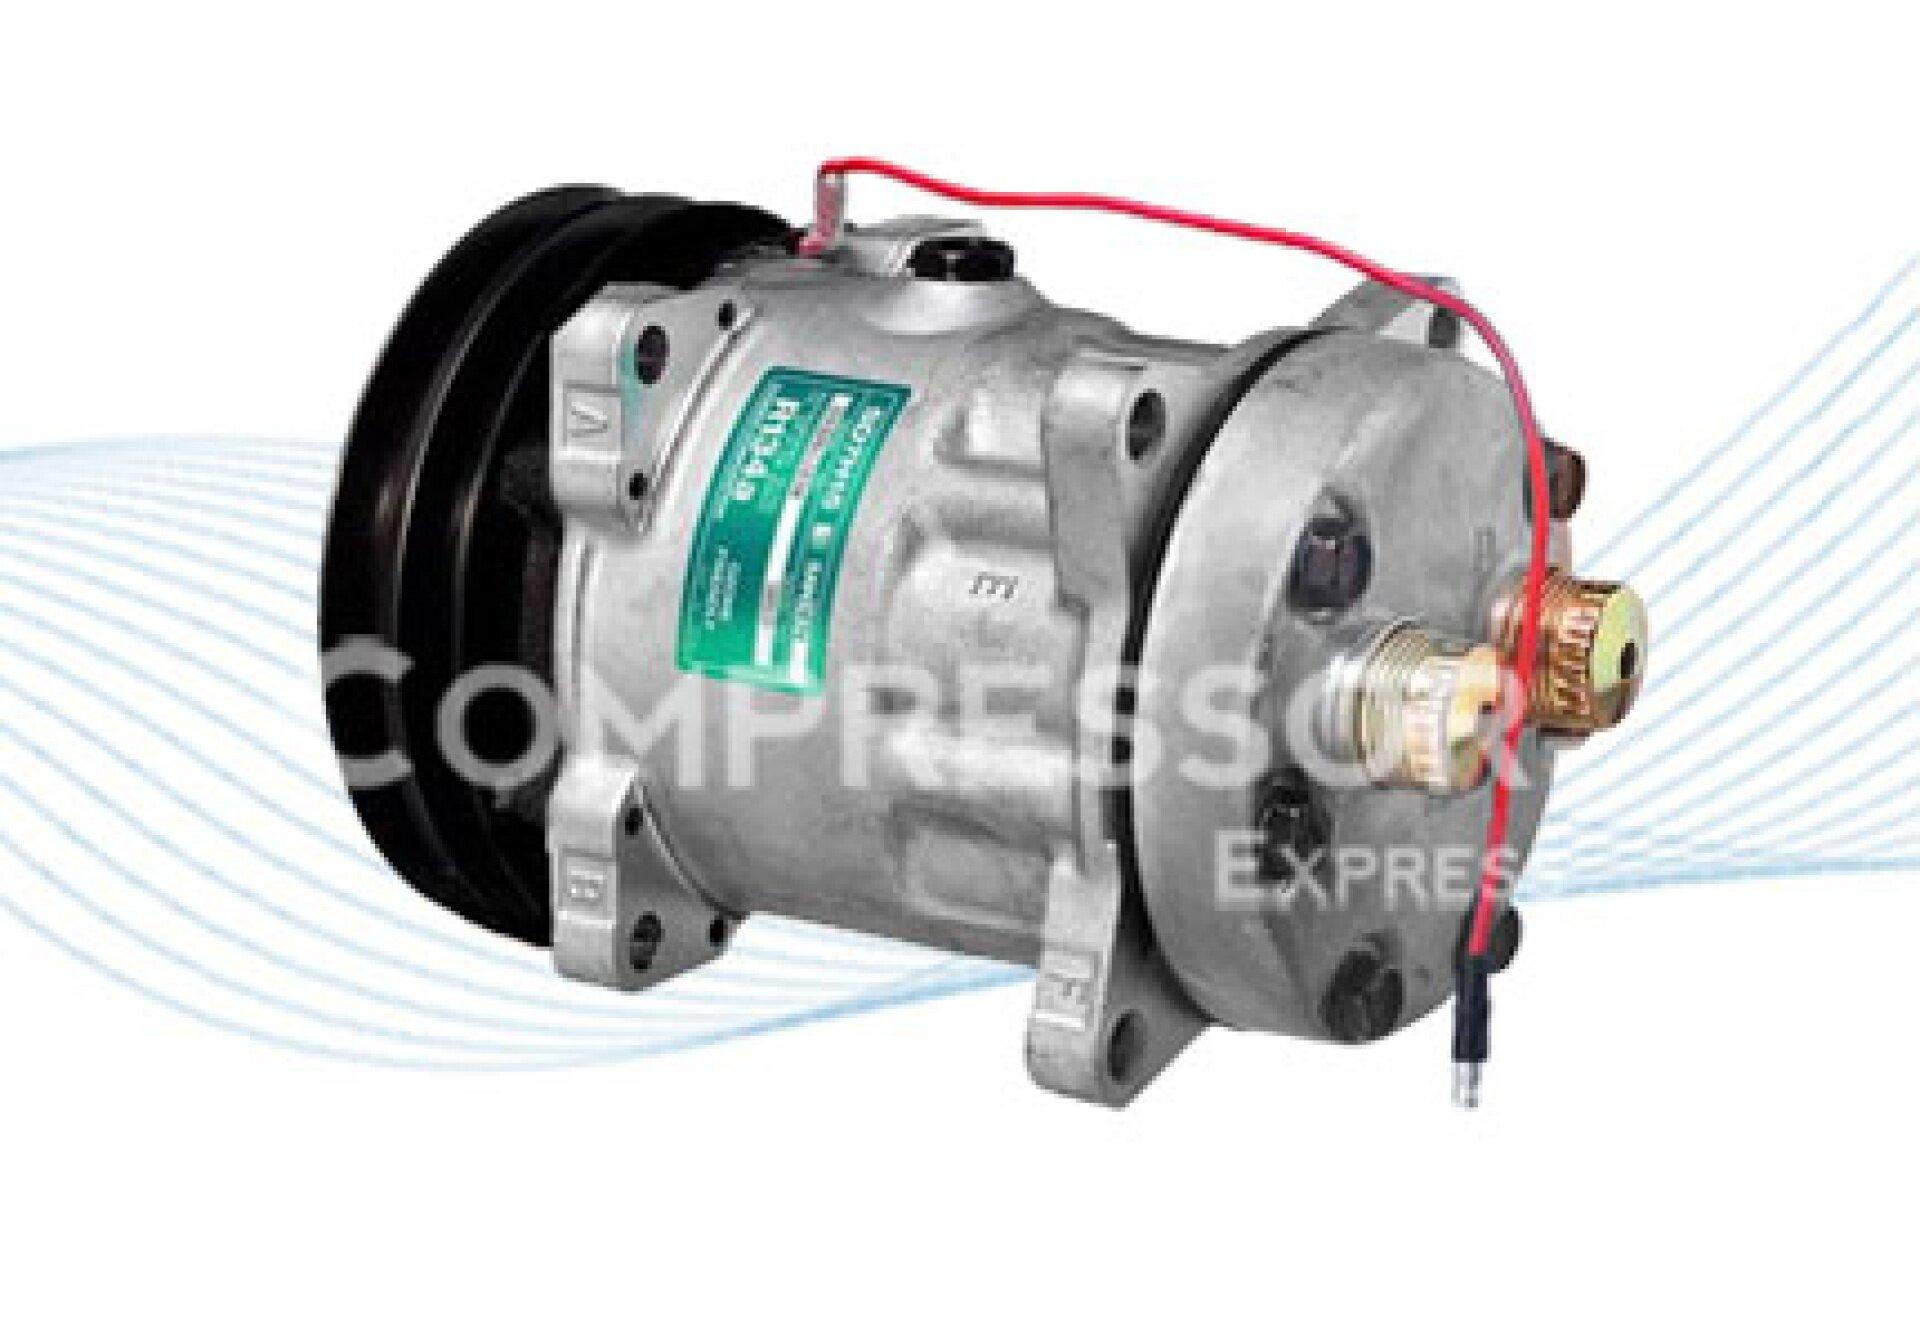 Sanden 7h15 Ac Compressor 8019 N A